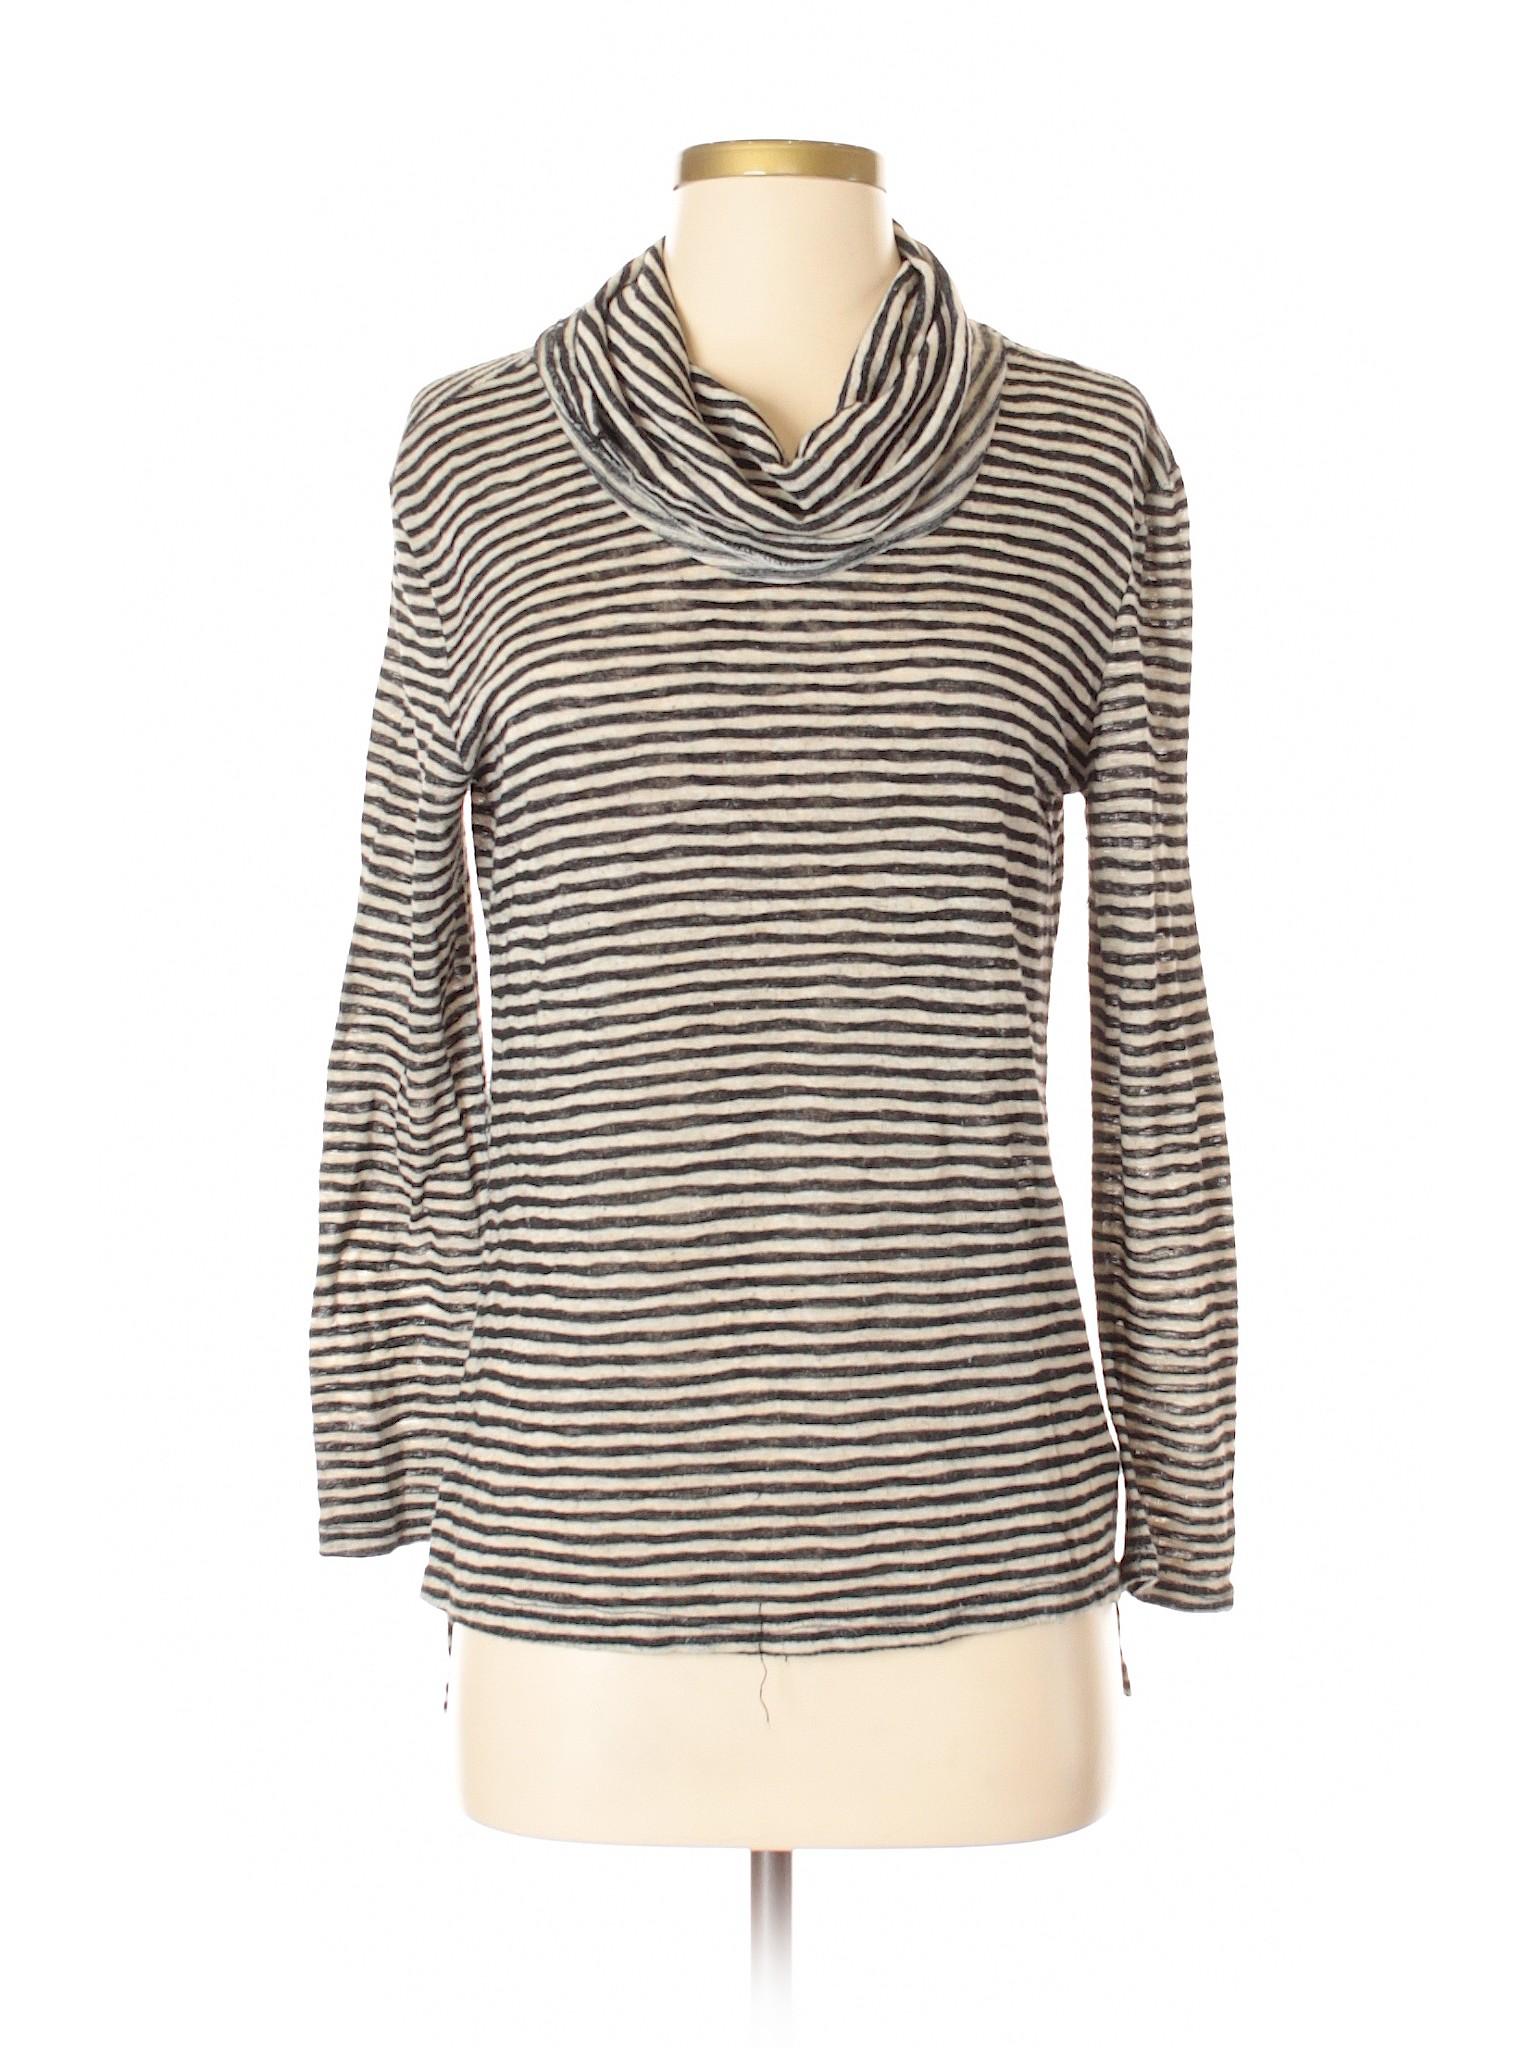 W5 Pullover Boutique Boutique Sweater W5 xnYERw8gzq